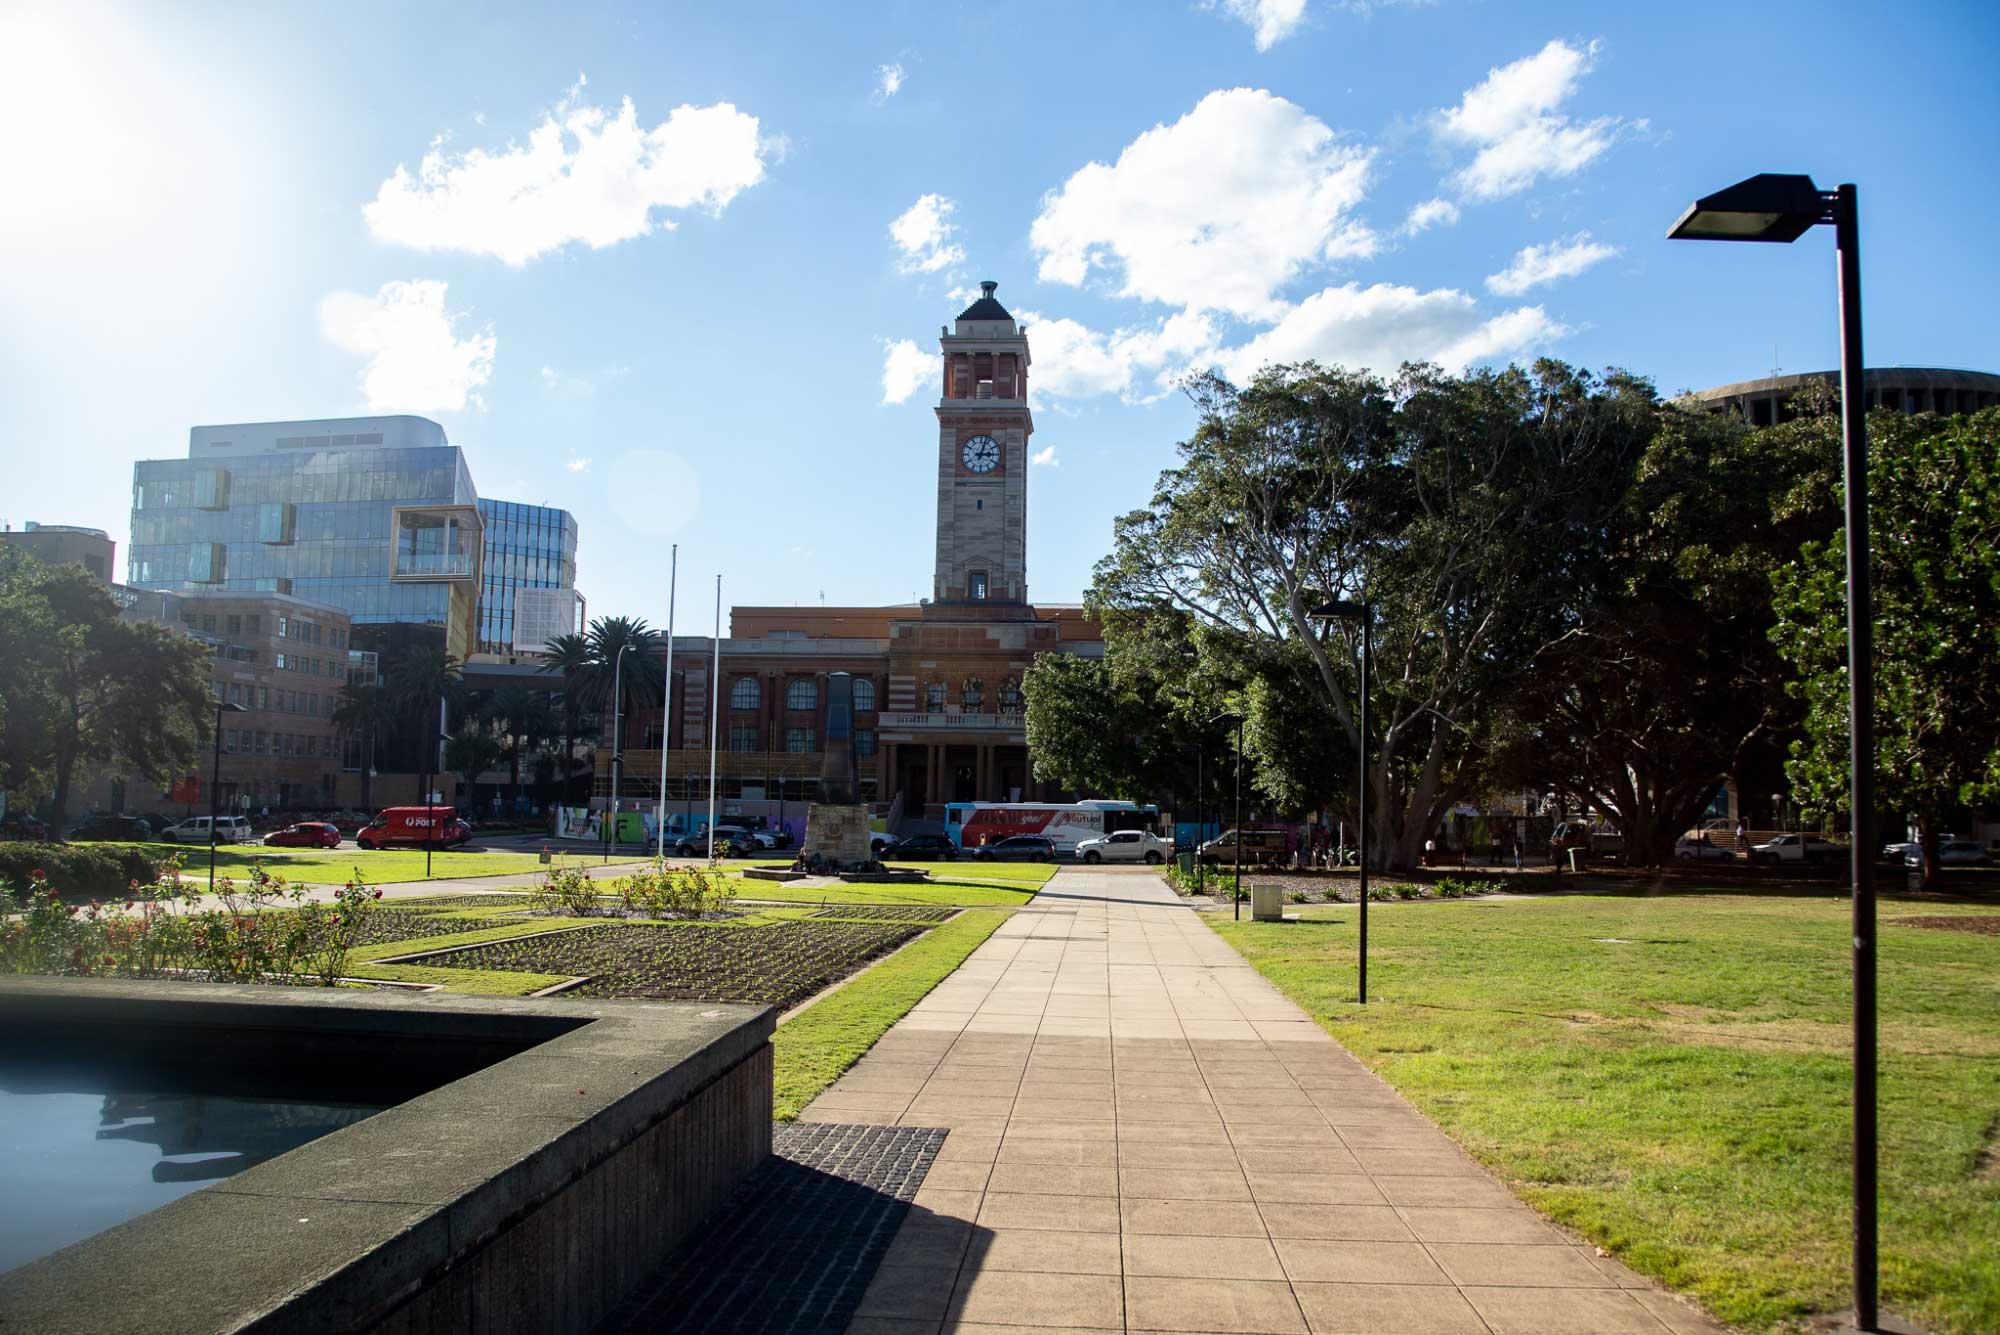 The city of Newcastle, Australia